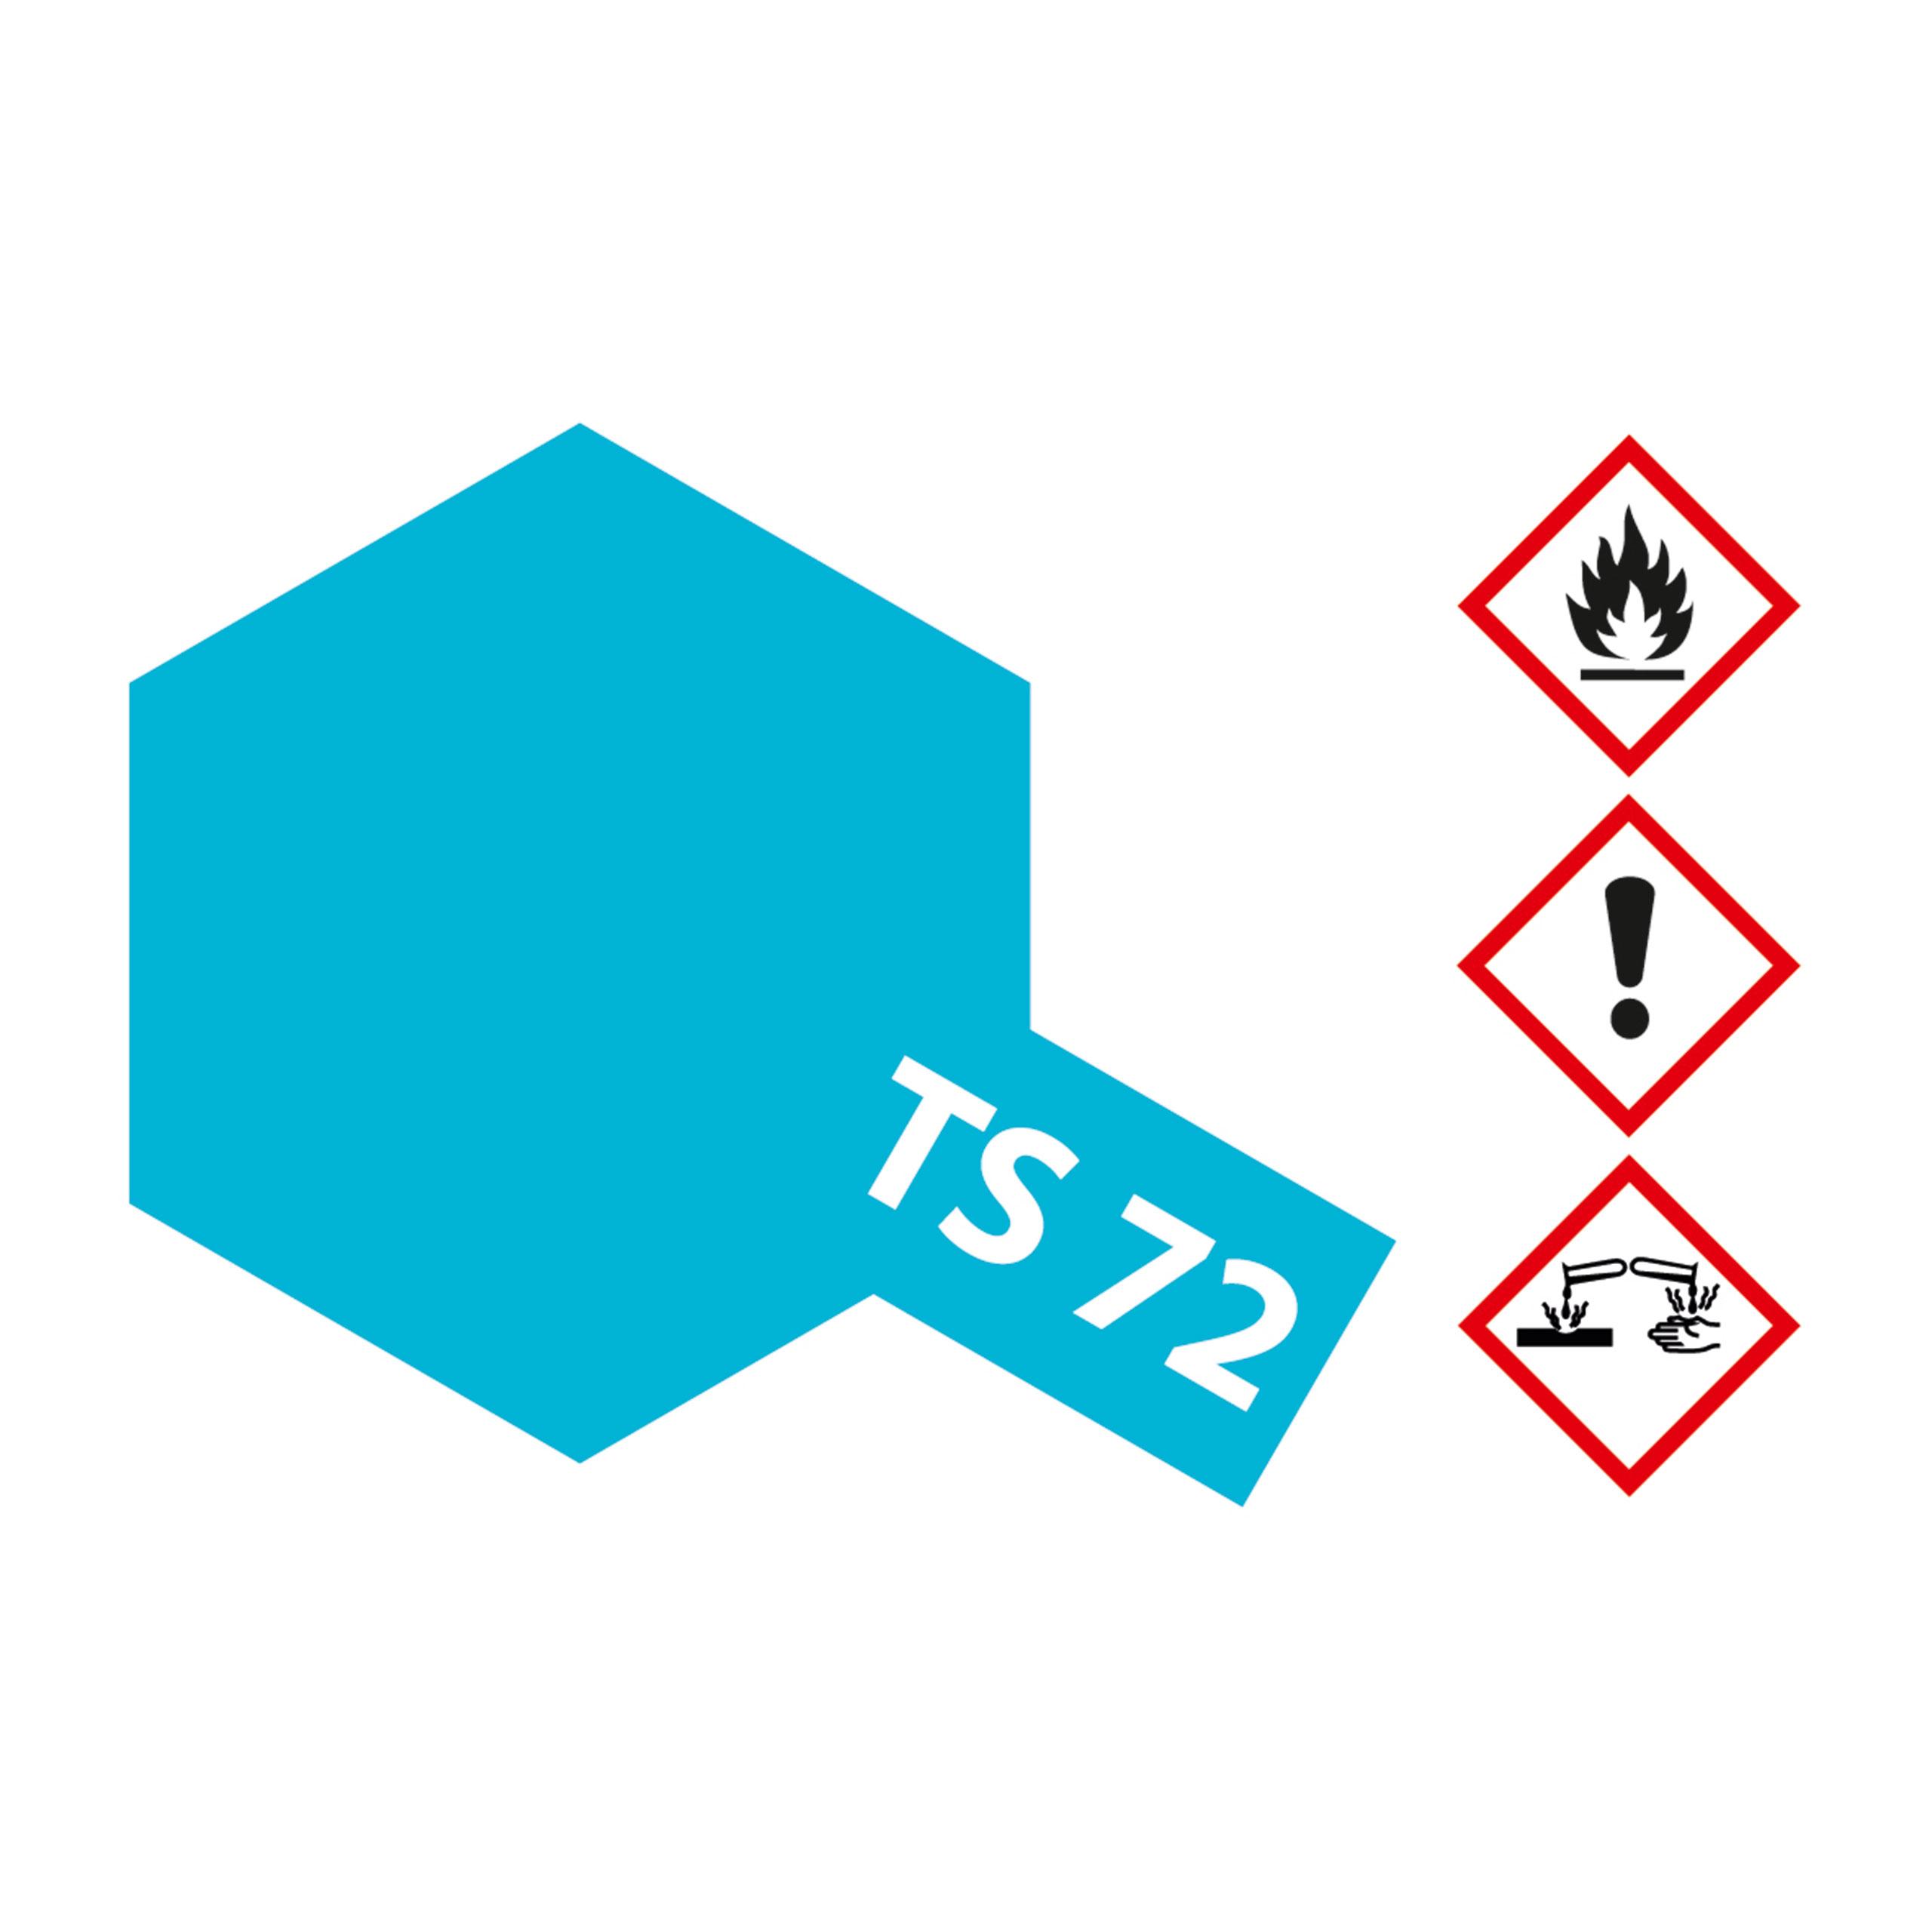 TS-72 Blau Transpar. Klar glaenz. - 100ml Sprayfarbe Kunstharz Tamiya 300085072